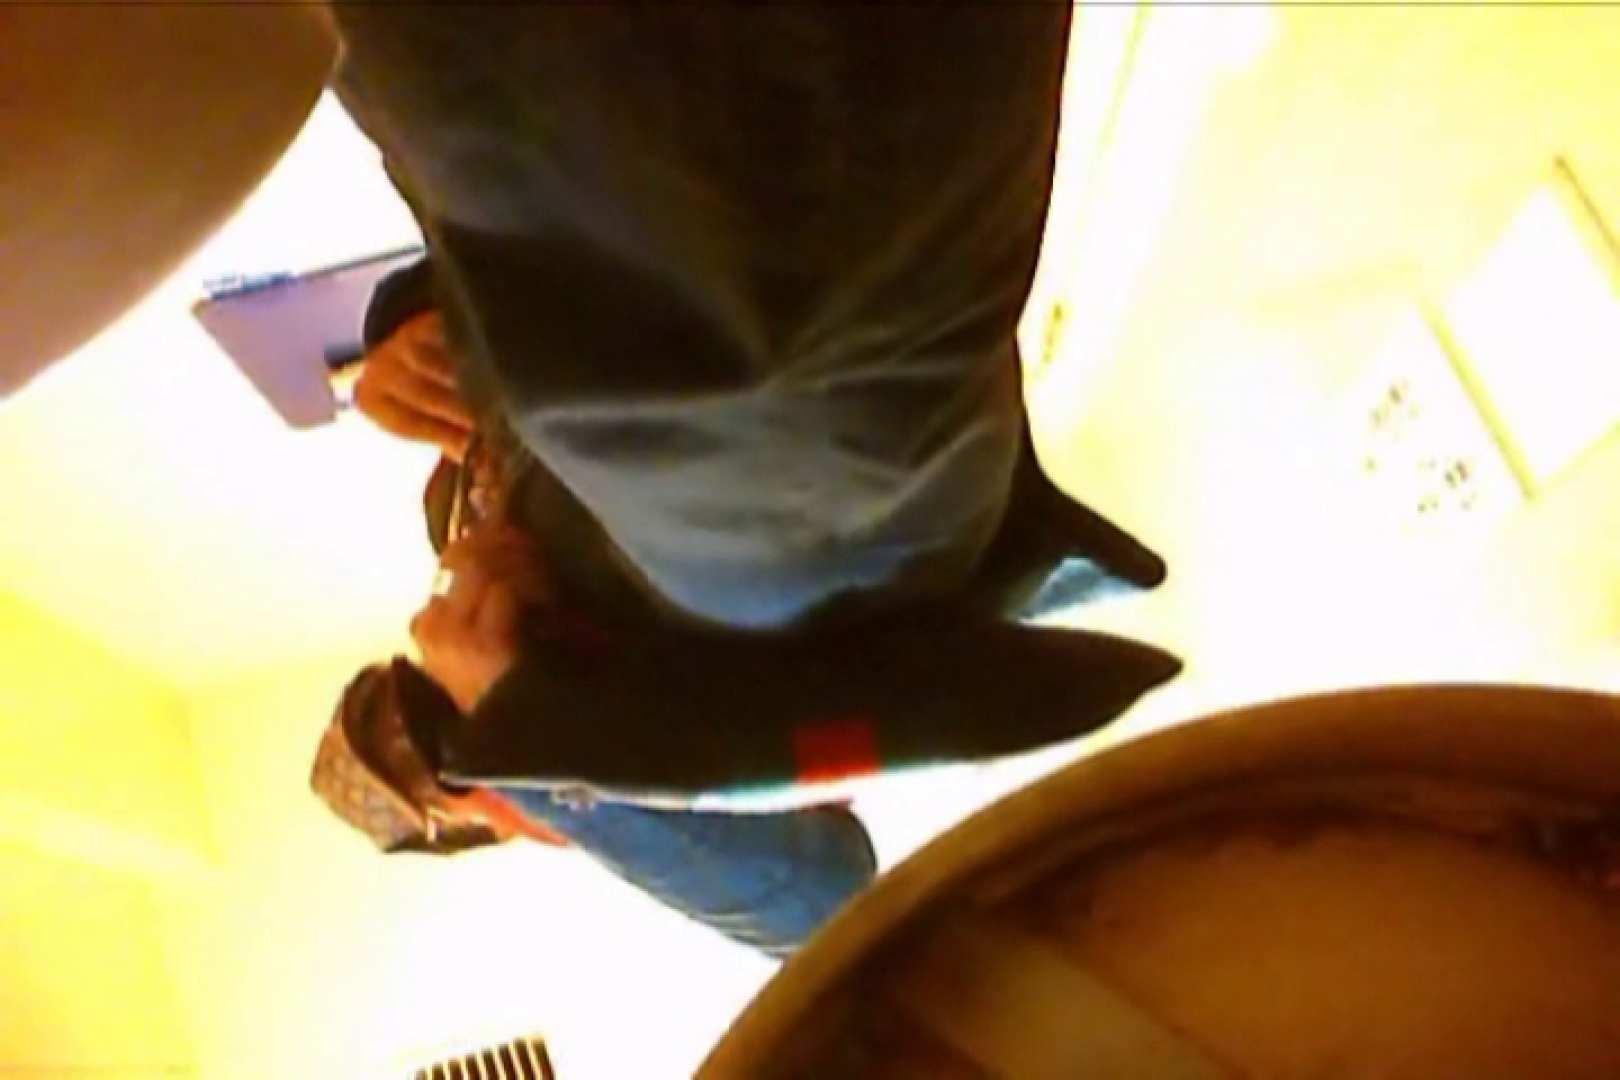 SEASON 2ND!掴み取りさんの洗面所覗き!in新幹線!VOL.13 リーマン系ボーイズ | 人気シリーズ  80pic 31